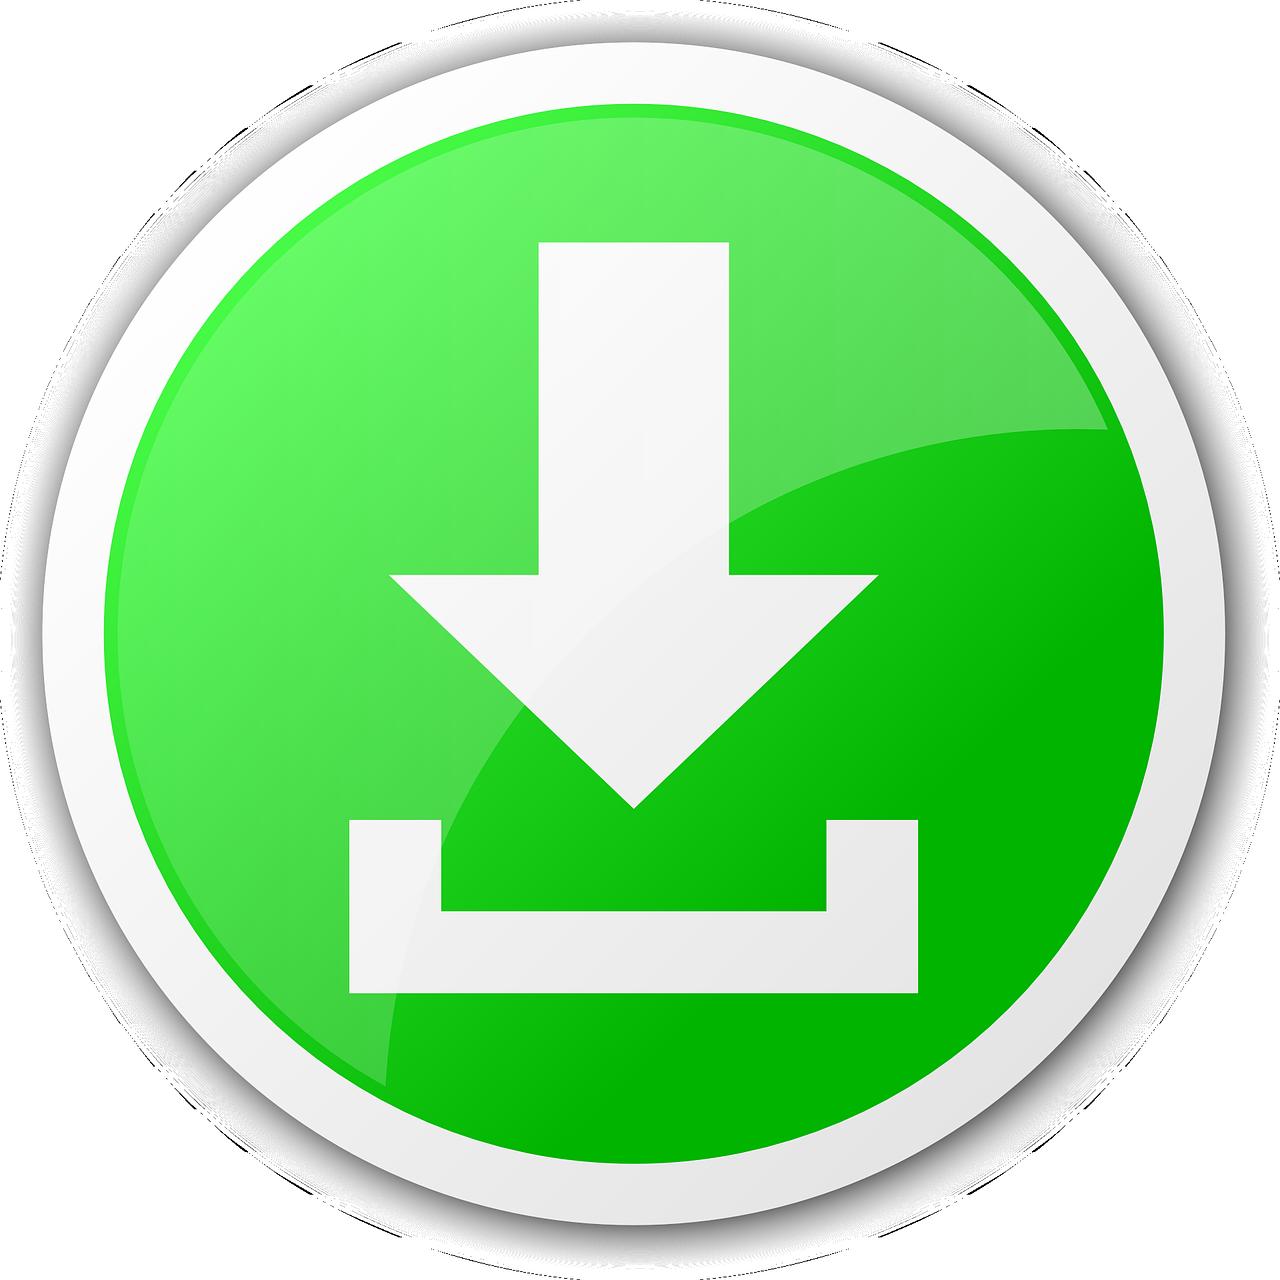 https://cdn.pixabay.com/photo/2013/07/13/11/32/arrow-158359_1280.png